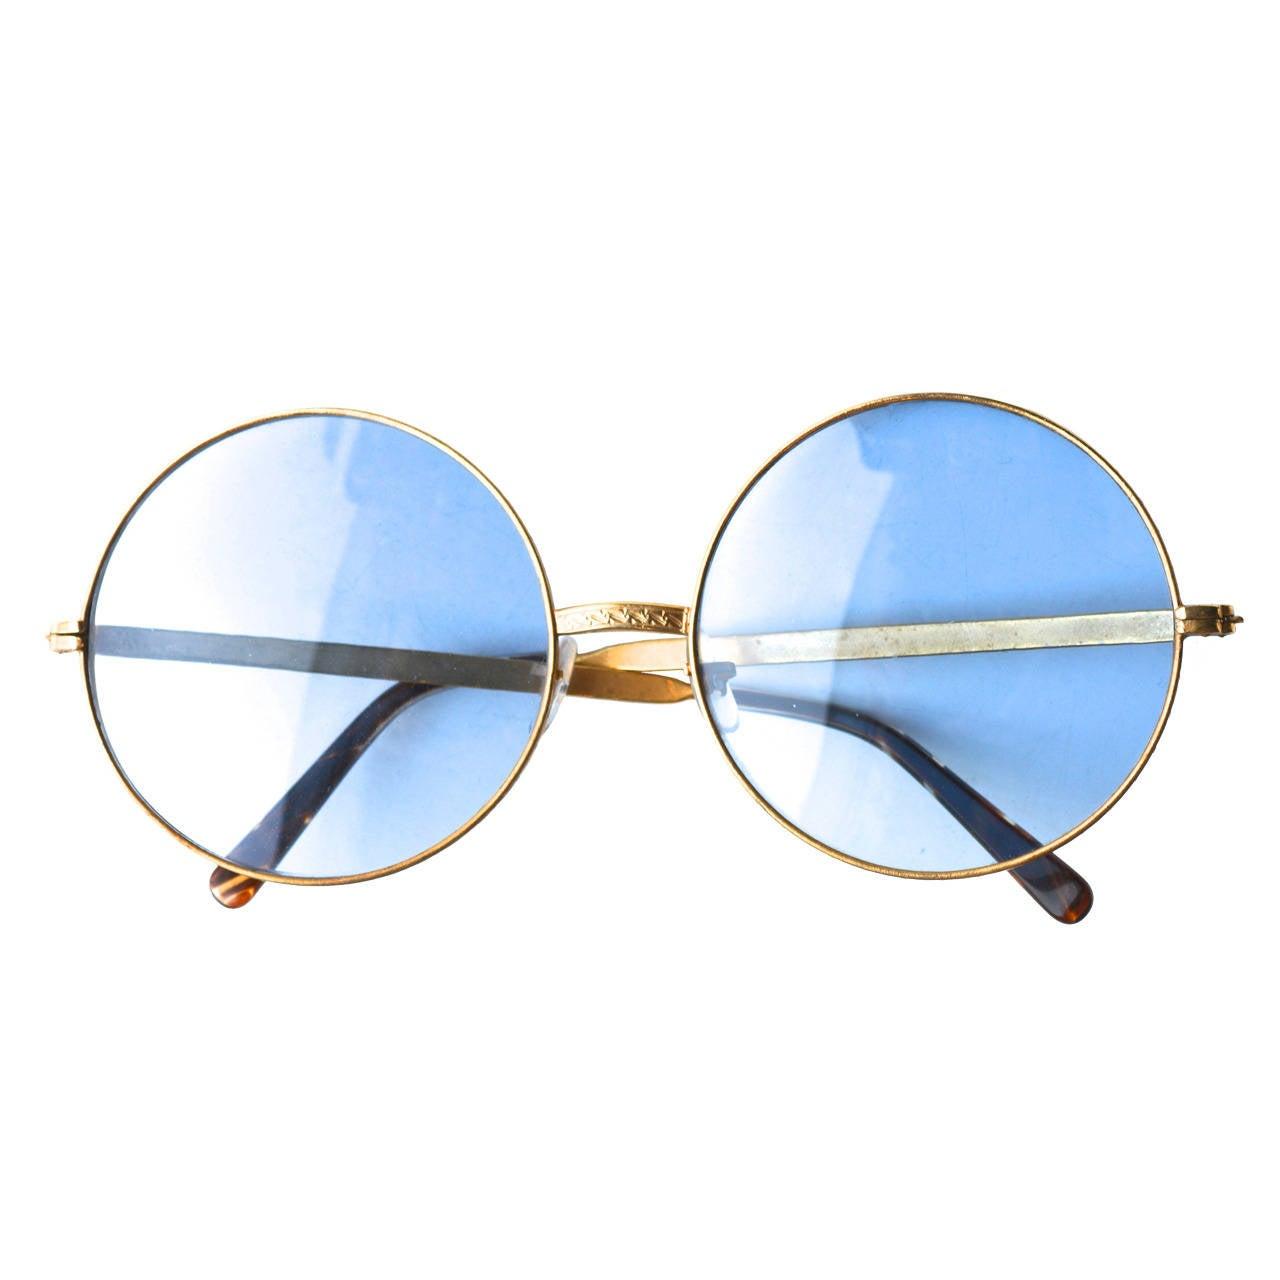 Sunglasses Circa 1960s Hippie Style 1